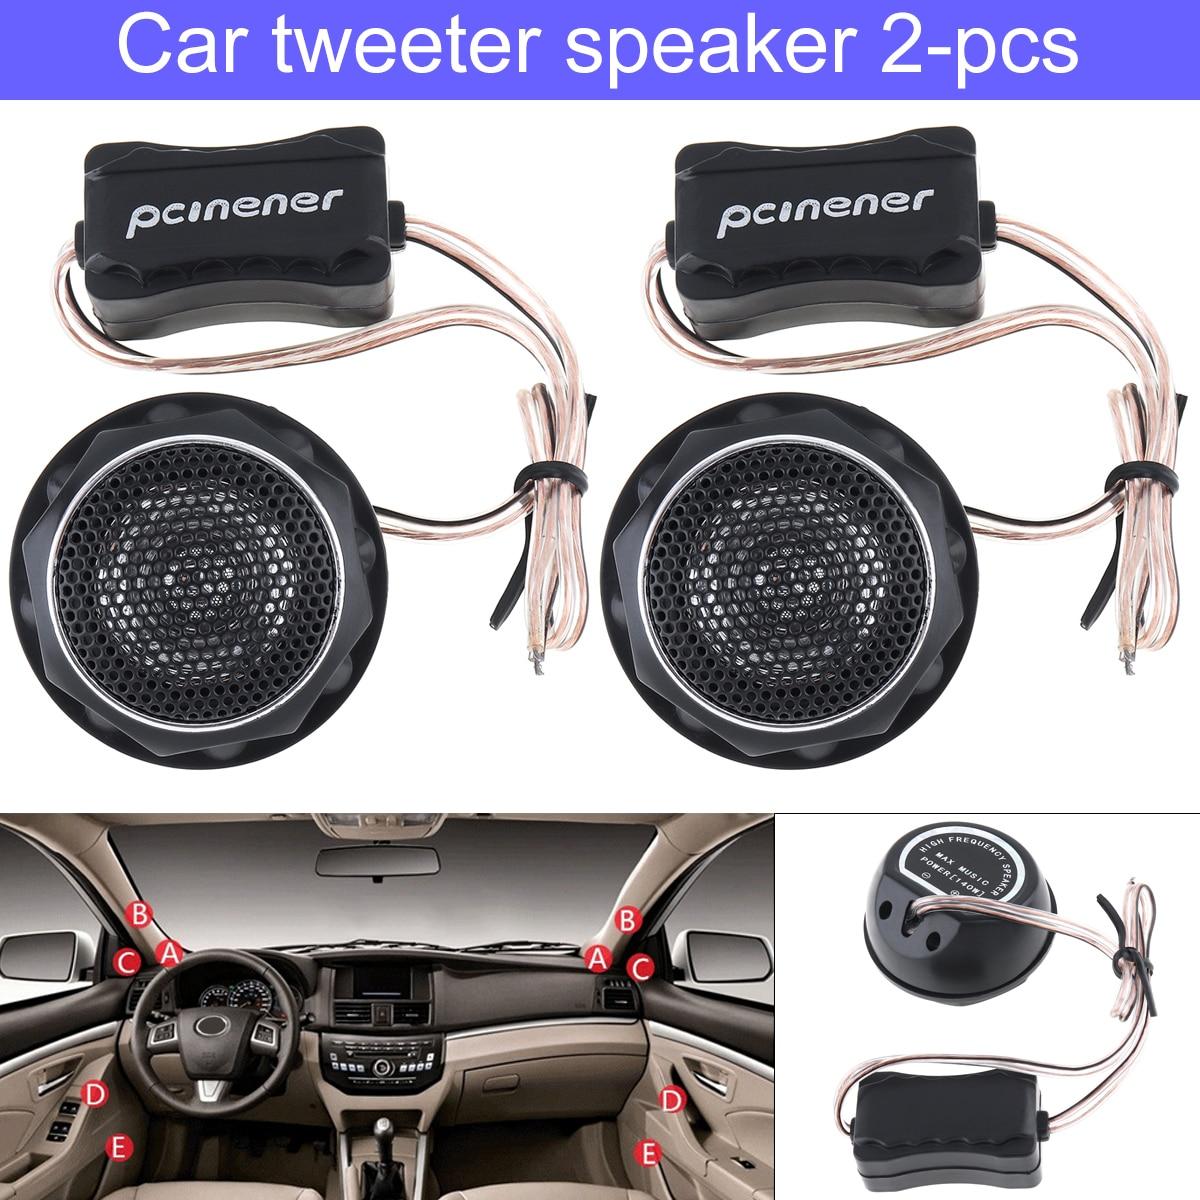 2pcs 12V 140W Car Speakers Tweetr High Efficiency Mini Dome Speakers Loundspeaker Lound speaker for Car Audio Sound System